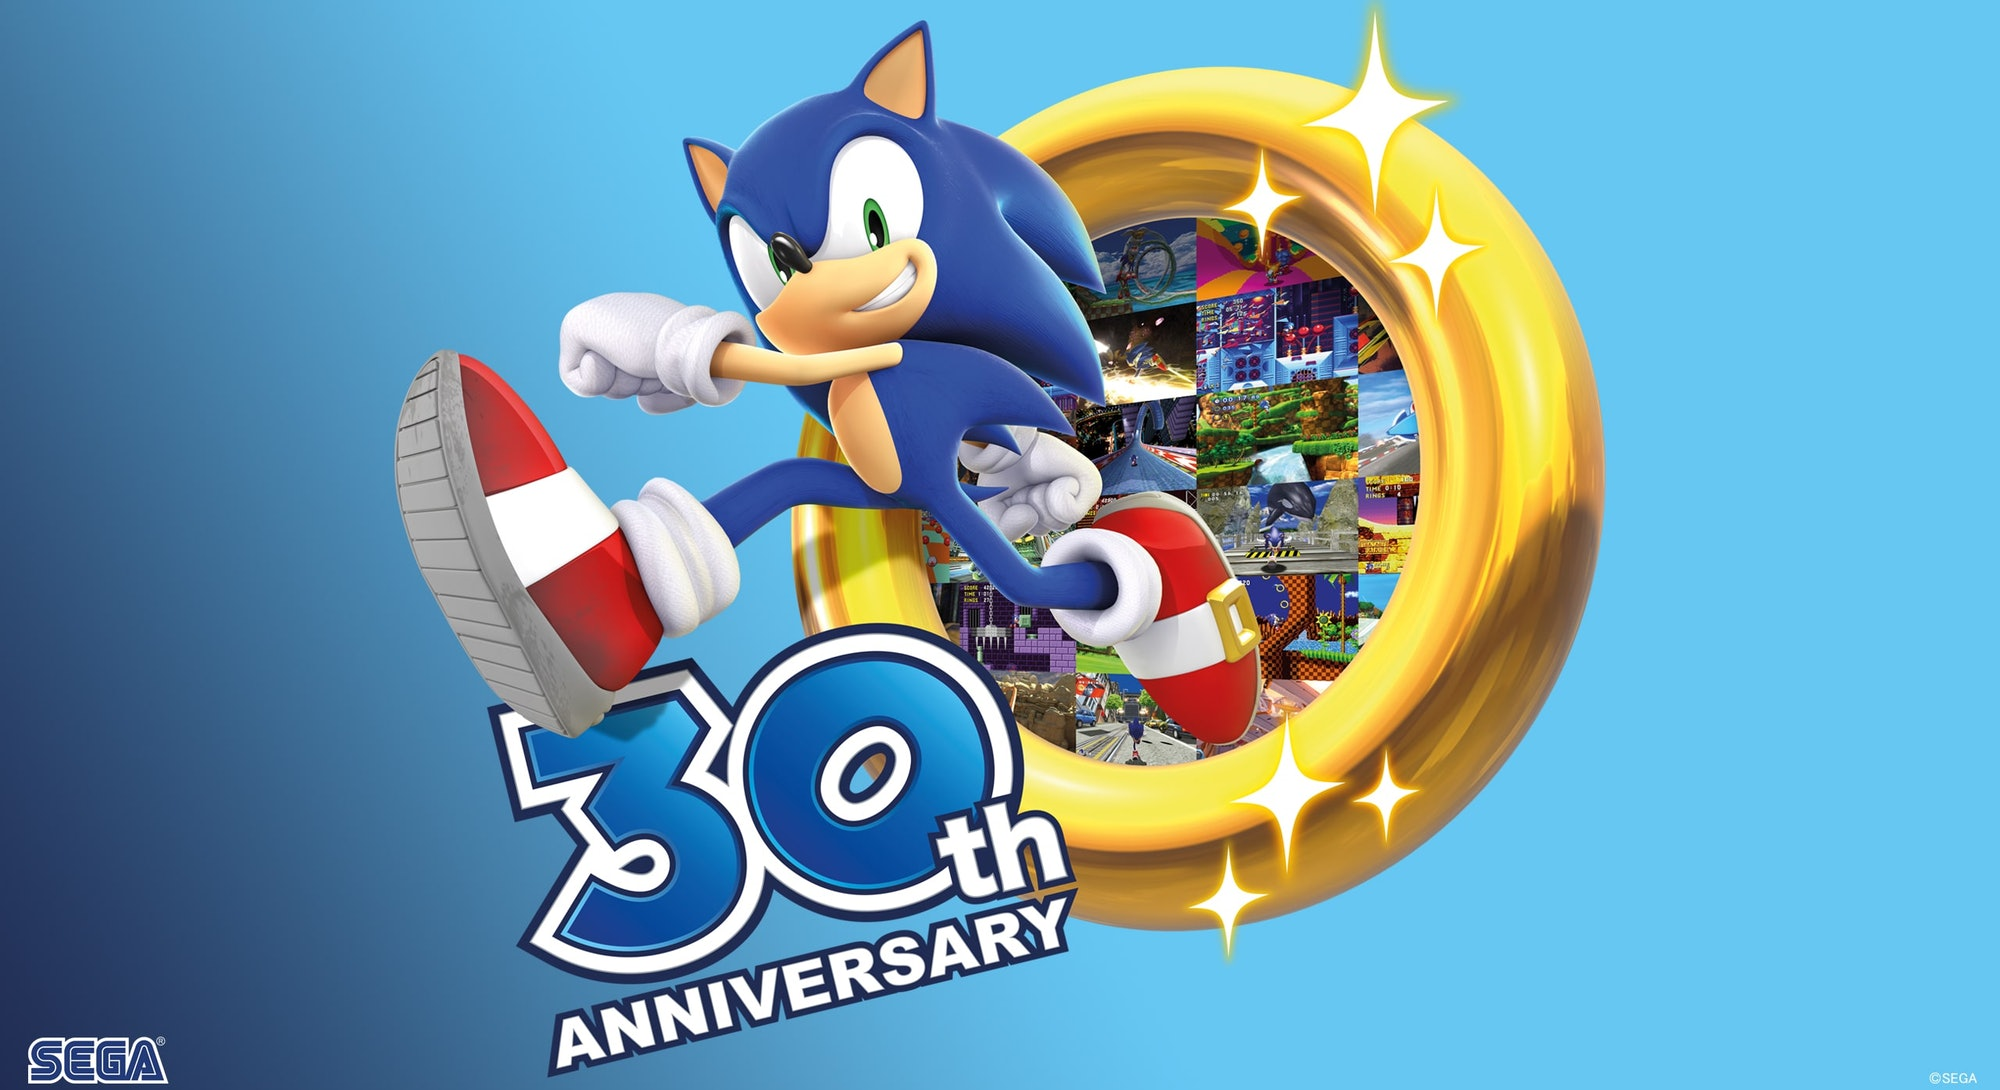 sonic the hedgehog 30th anniversary